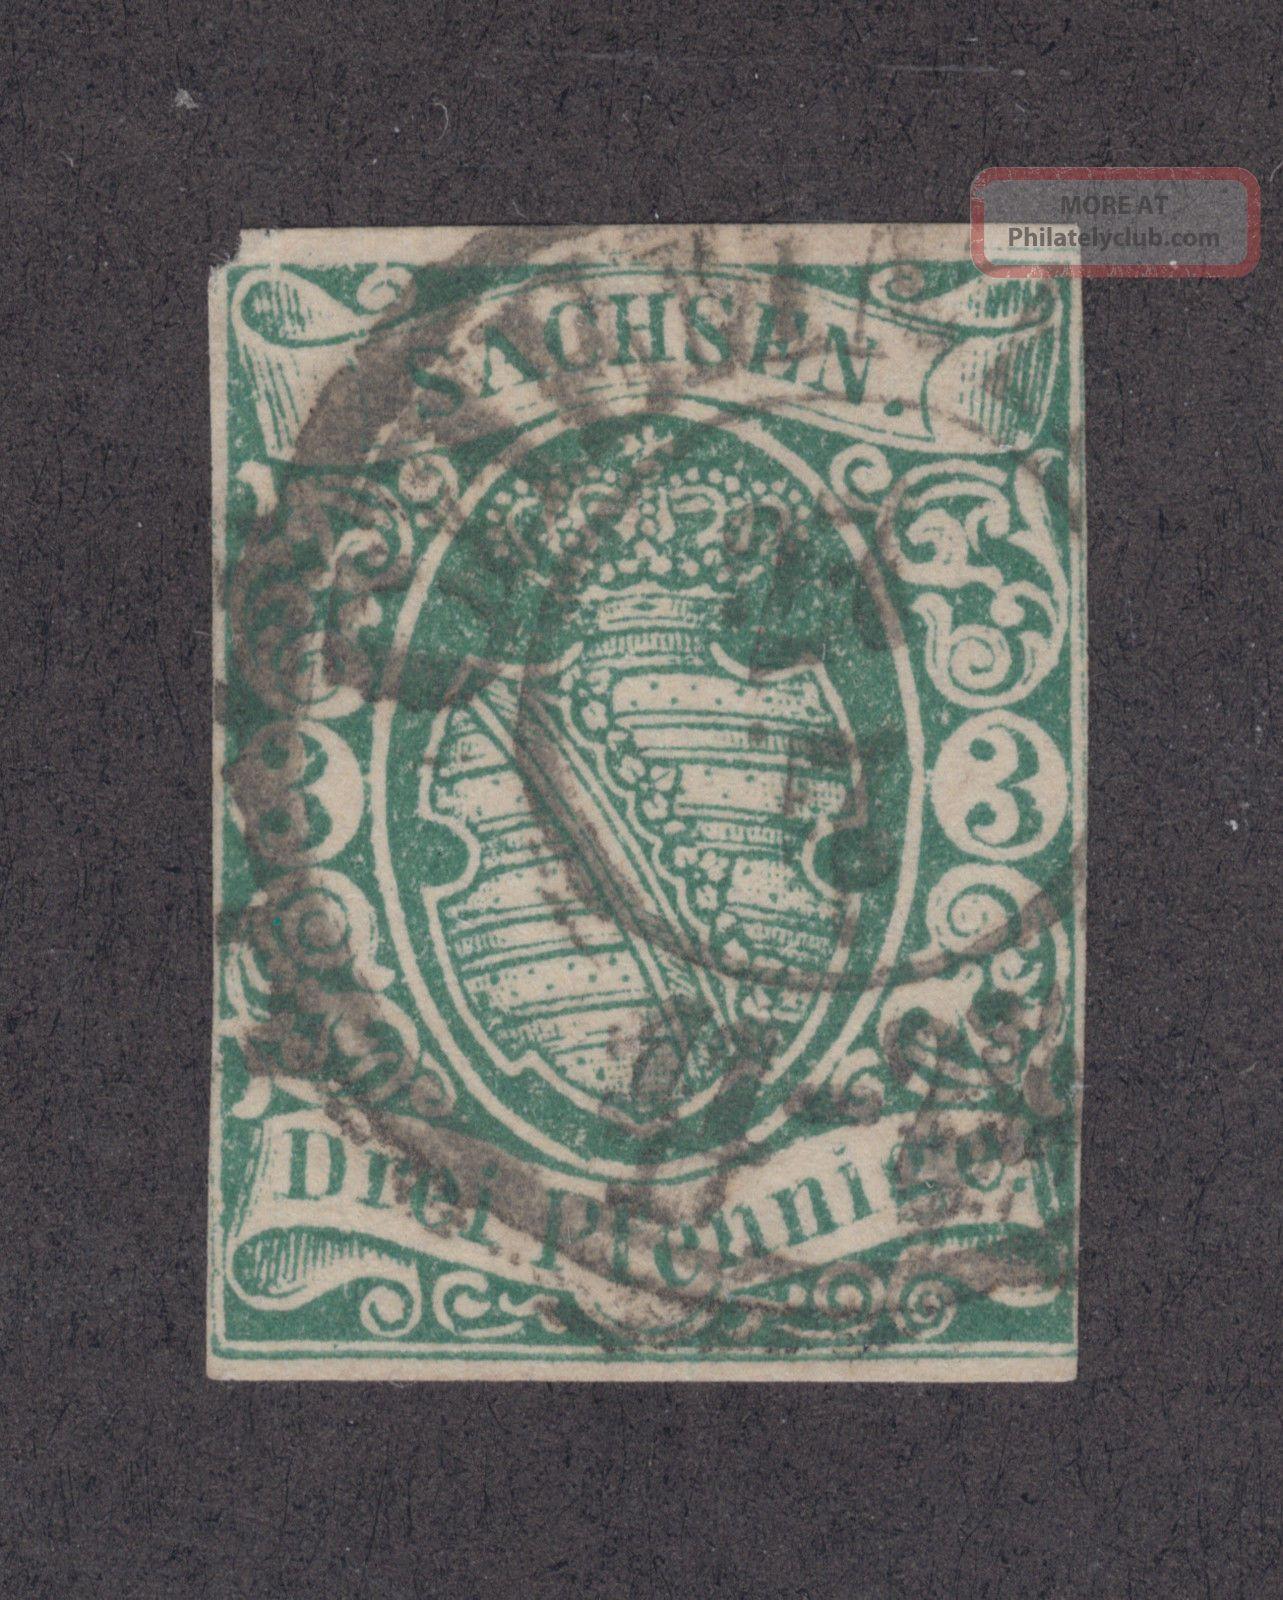 Saxony Sc 2 1851 2a Green Coar Of Arms,  Chemnitz Cds,  4 Margins Europe photo